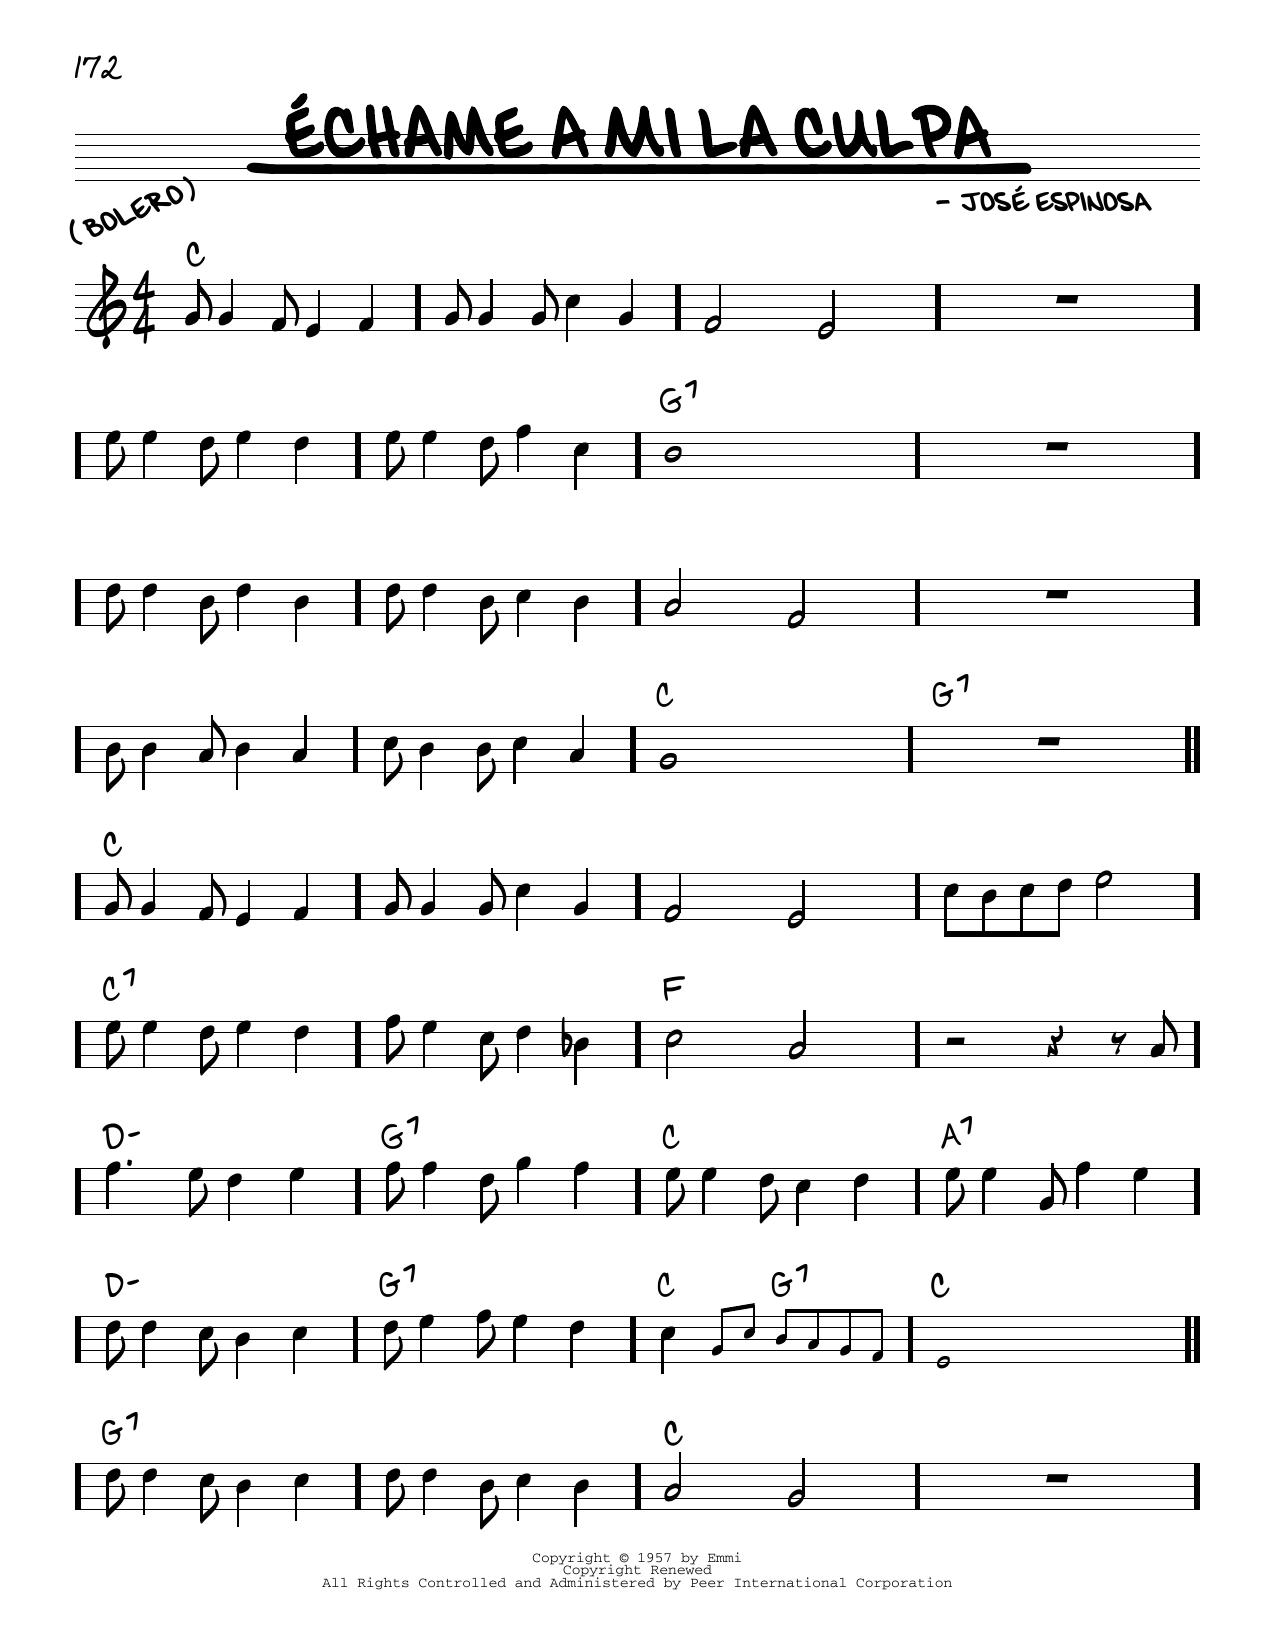 José Espinosa Echame A Mi La Culpa sheet music notes and chords. Download Printable PDF.